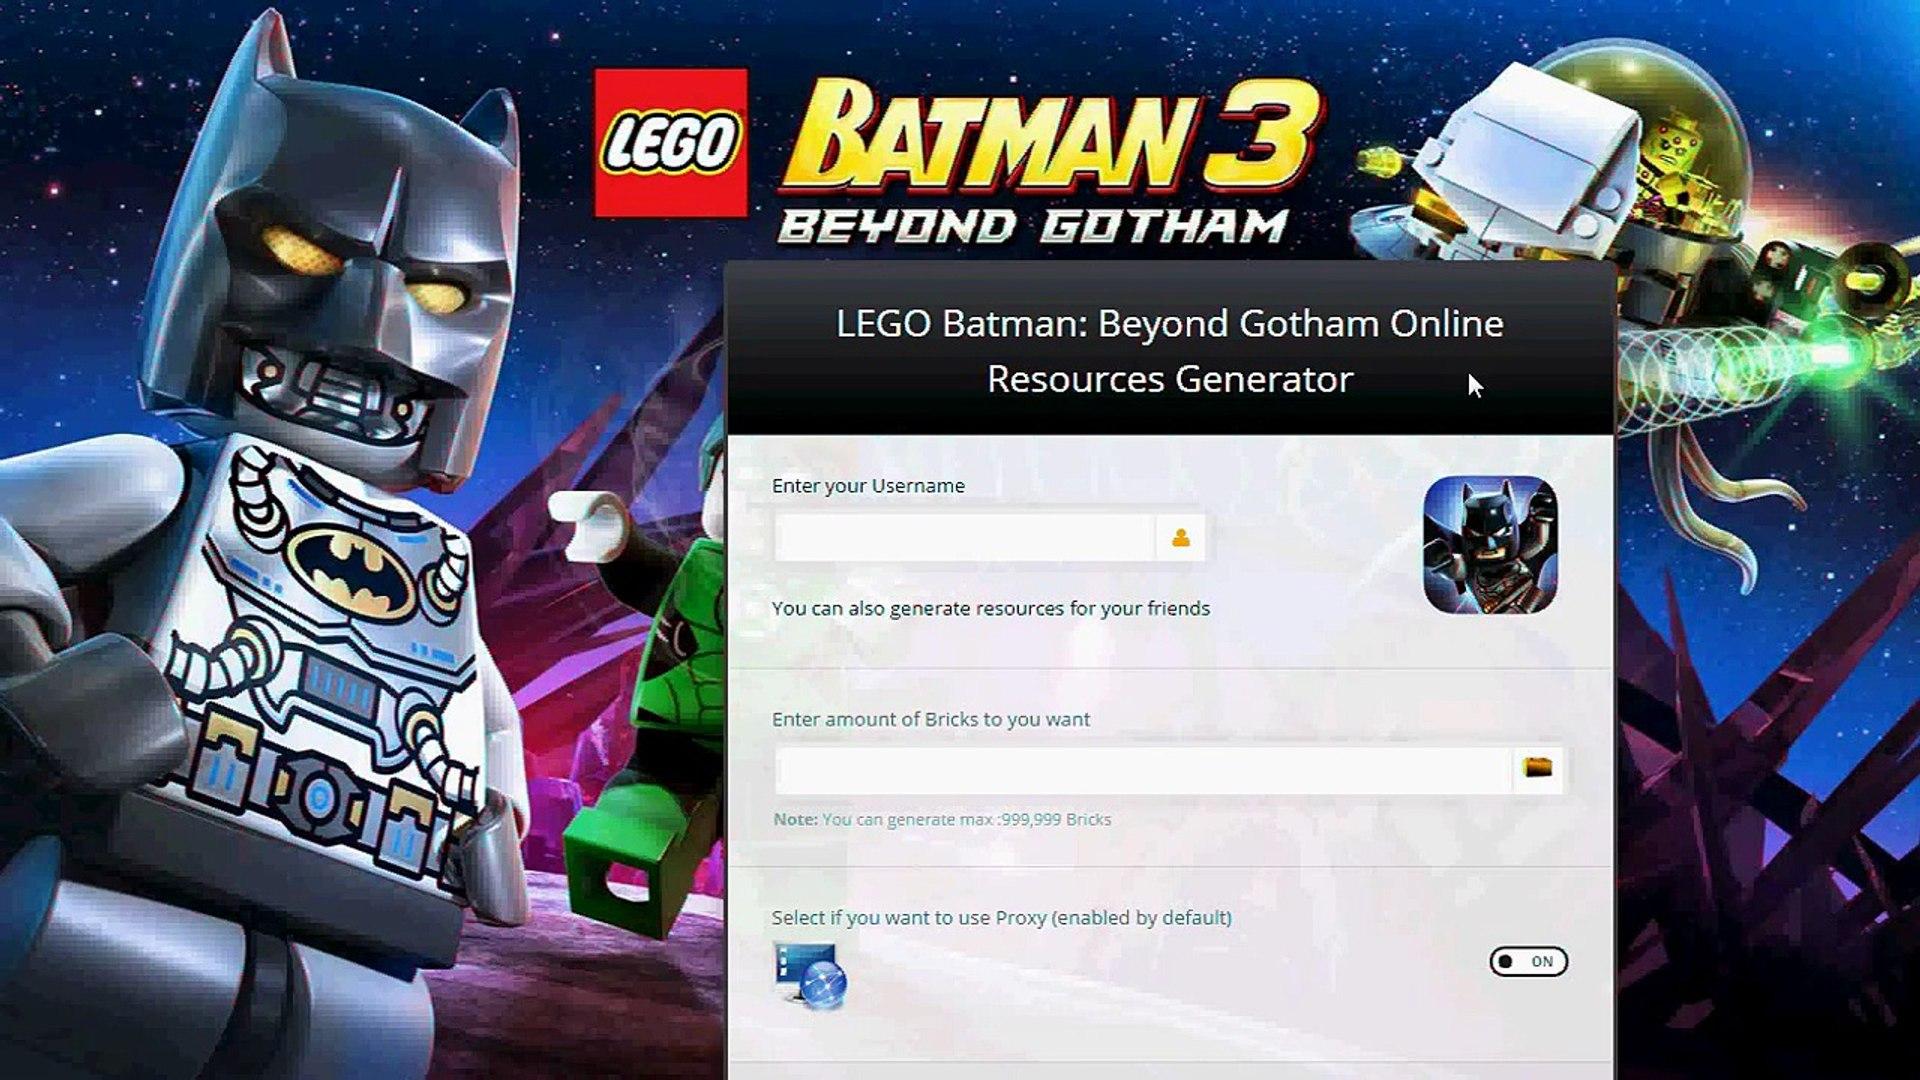 LEGO Batman 3 Beyond Gotham Crate of Bricks Cheats iOS Android